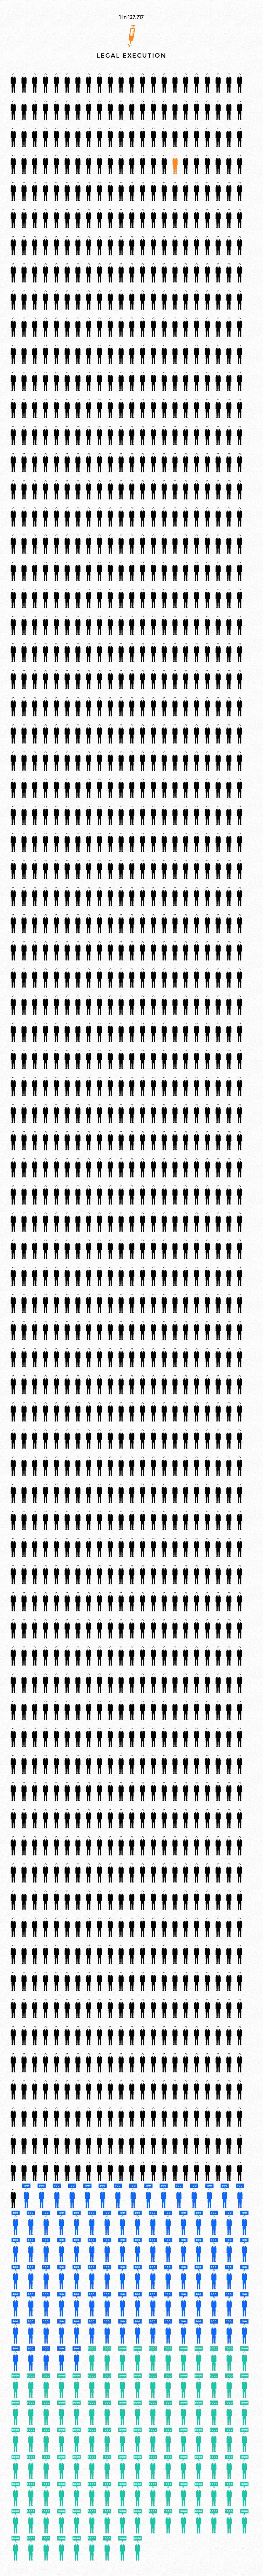 death-infographic11